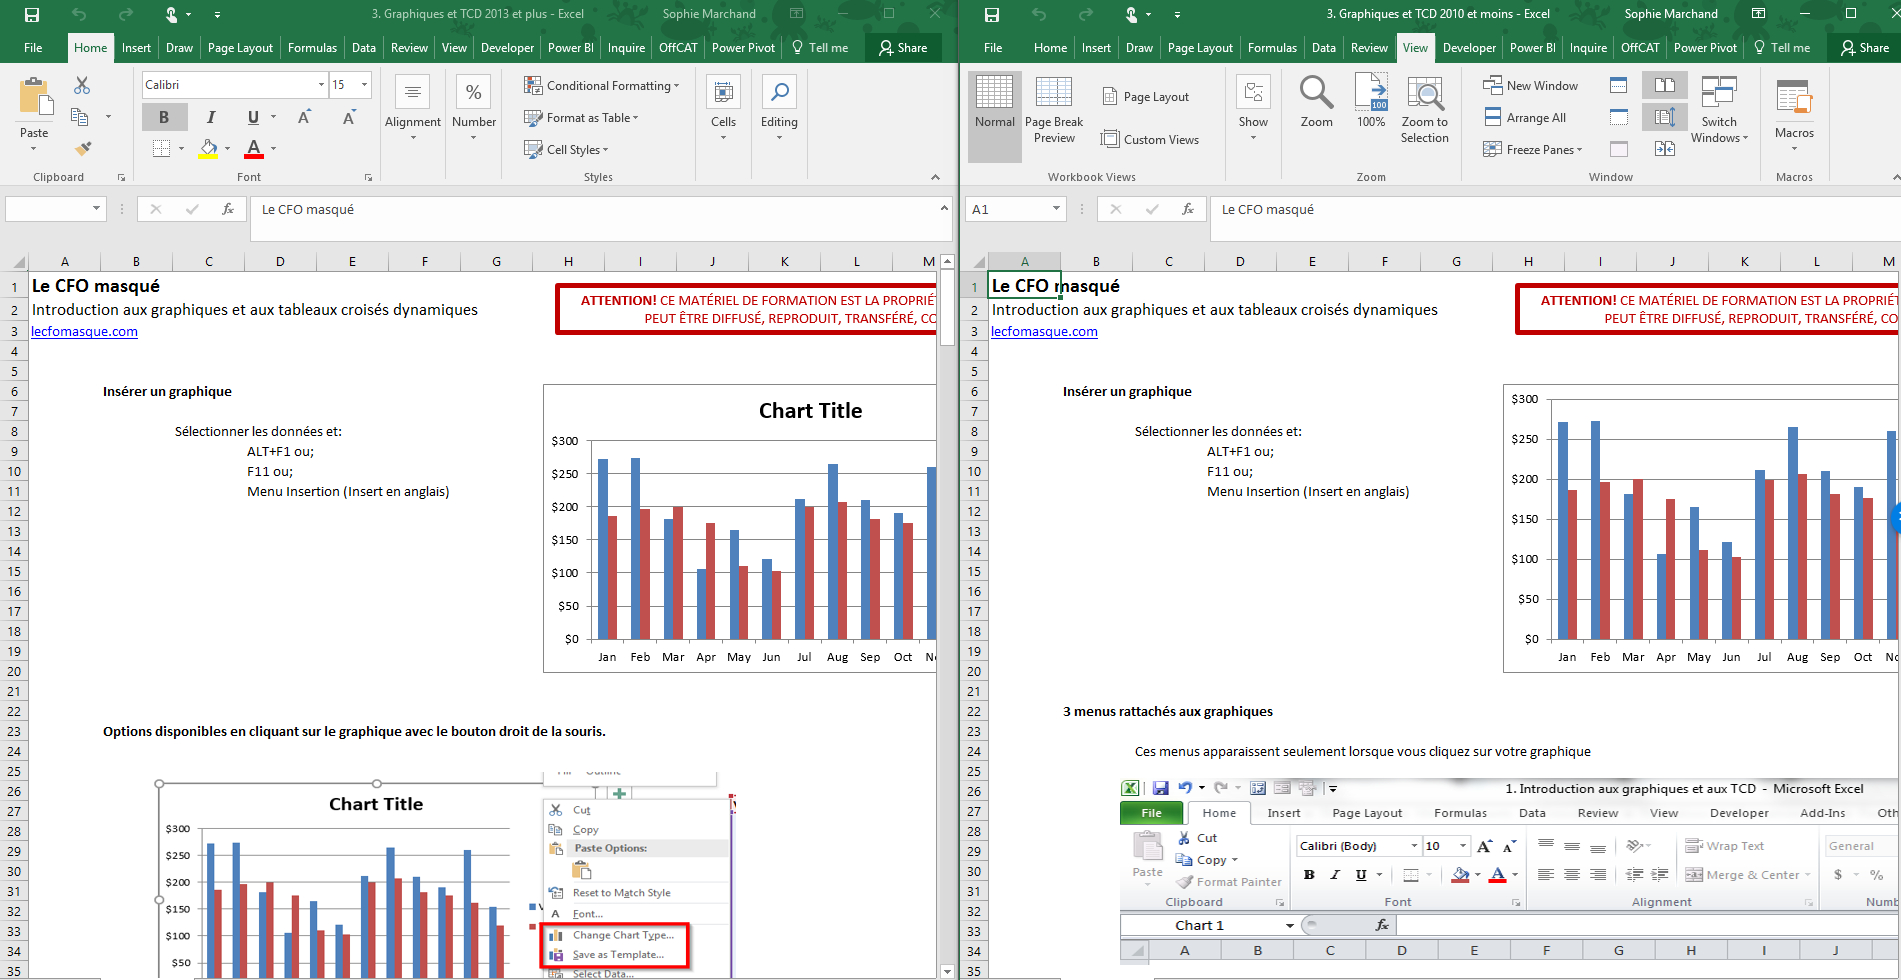 Spreadsheet Compare 2016 Intended For Spreadsheet Compare: Comparer Deux Fichiers Excel Aisément  Le Cfo